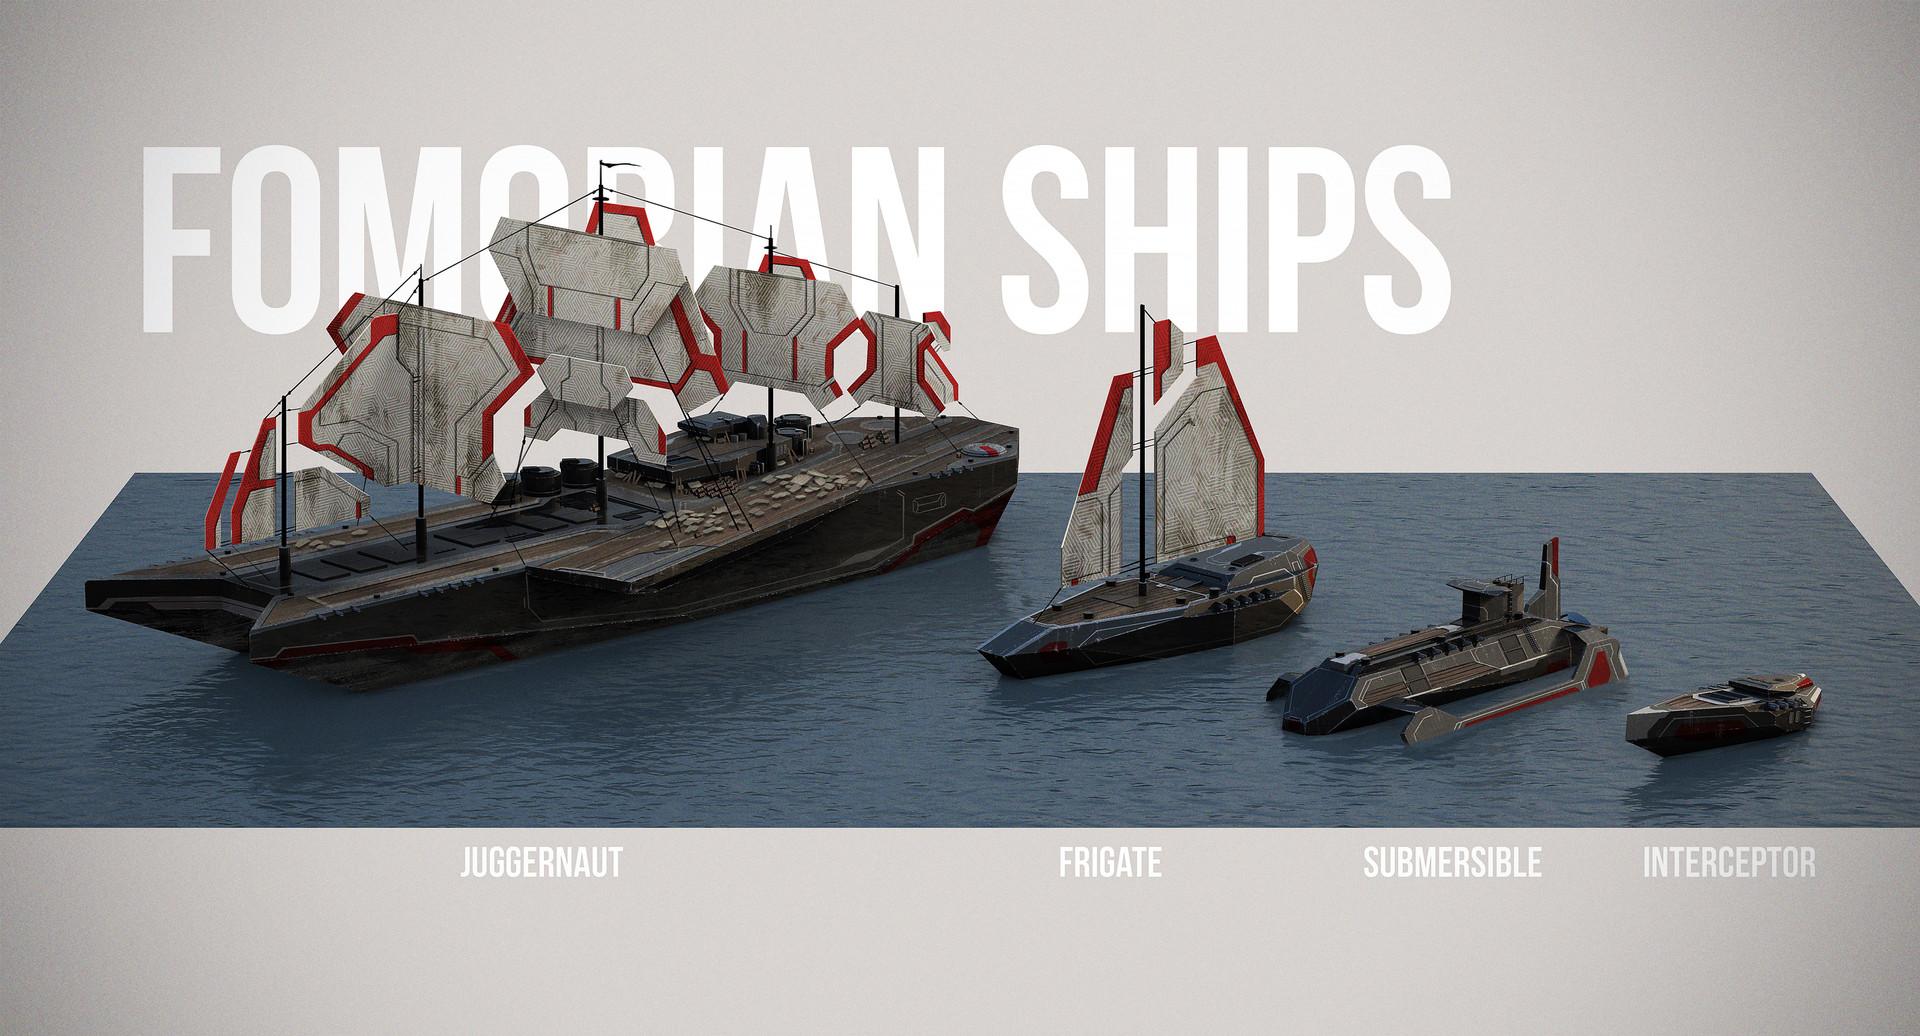 thomas-du-crest-fomorians-ships-03.jpg?1